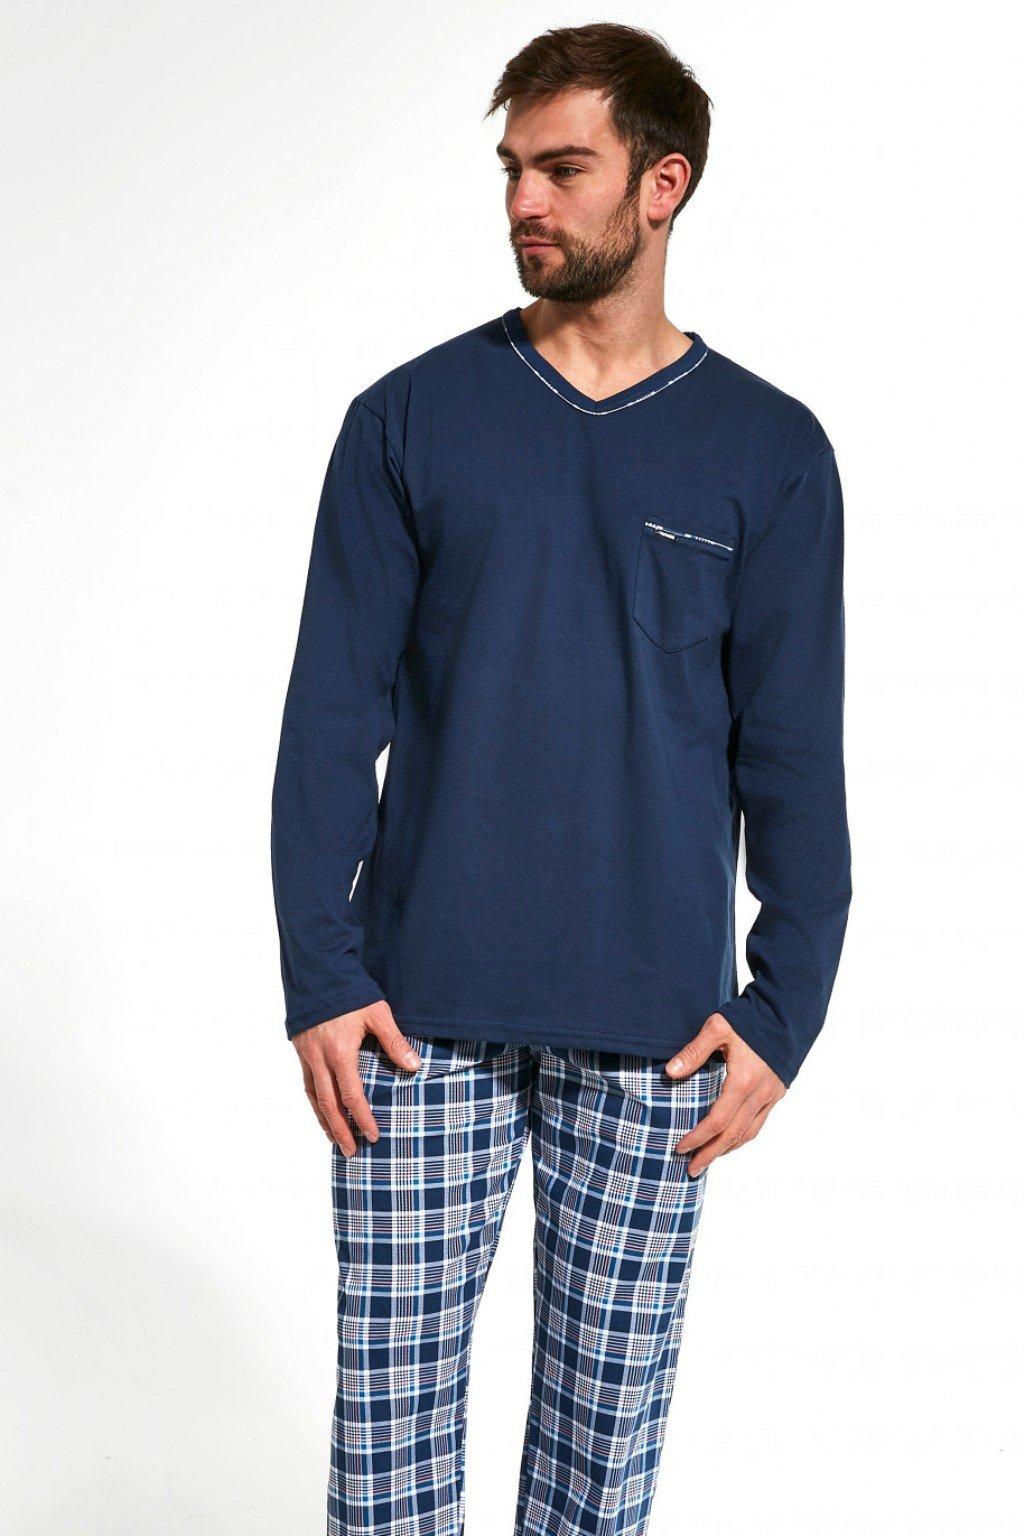 Pánské pyžamo Cornette 122/168 Eric